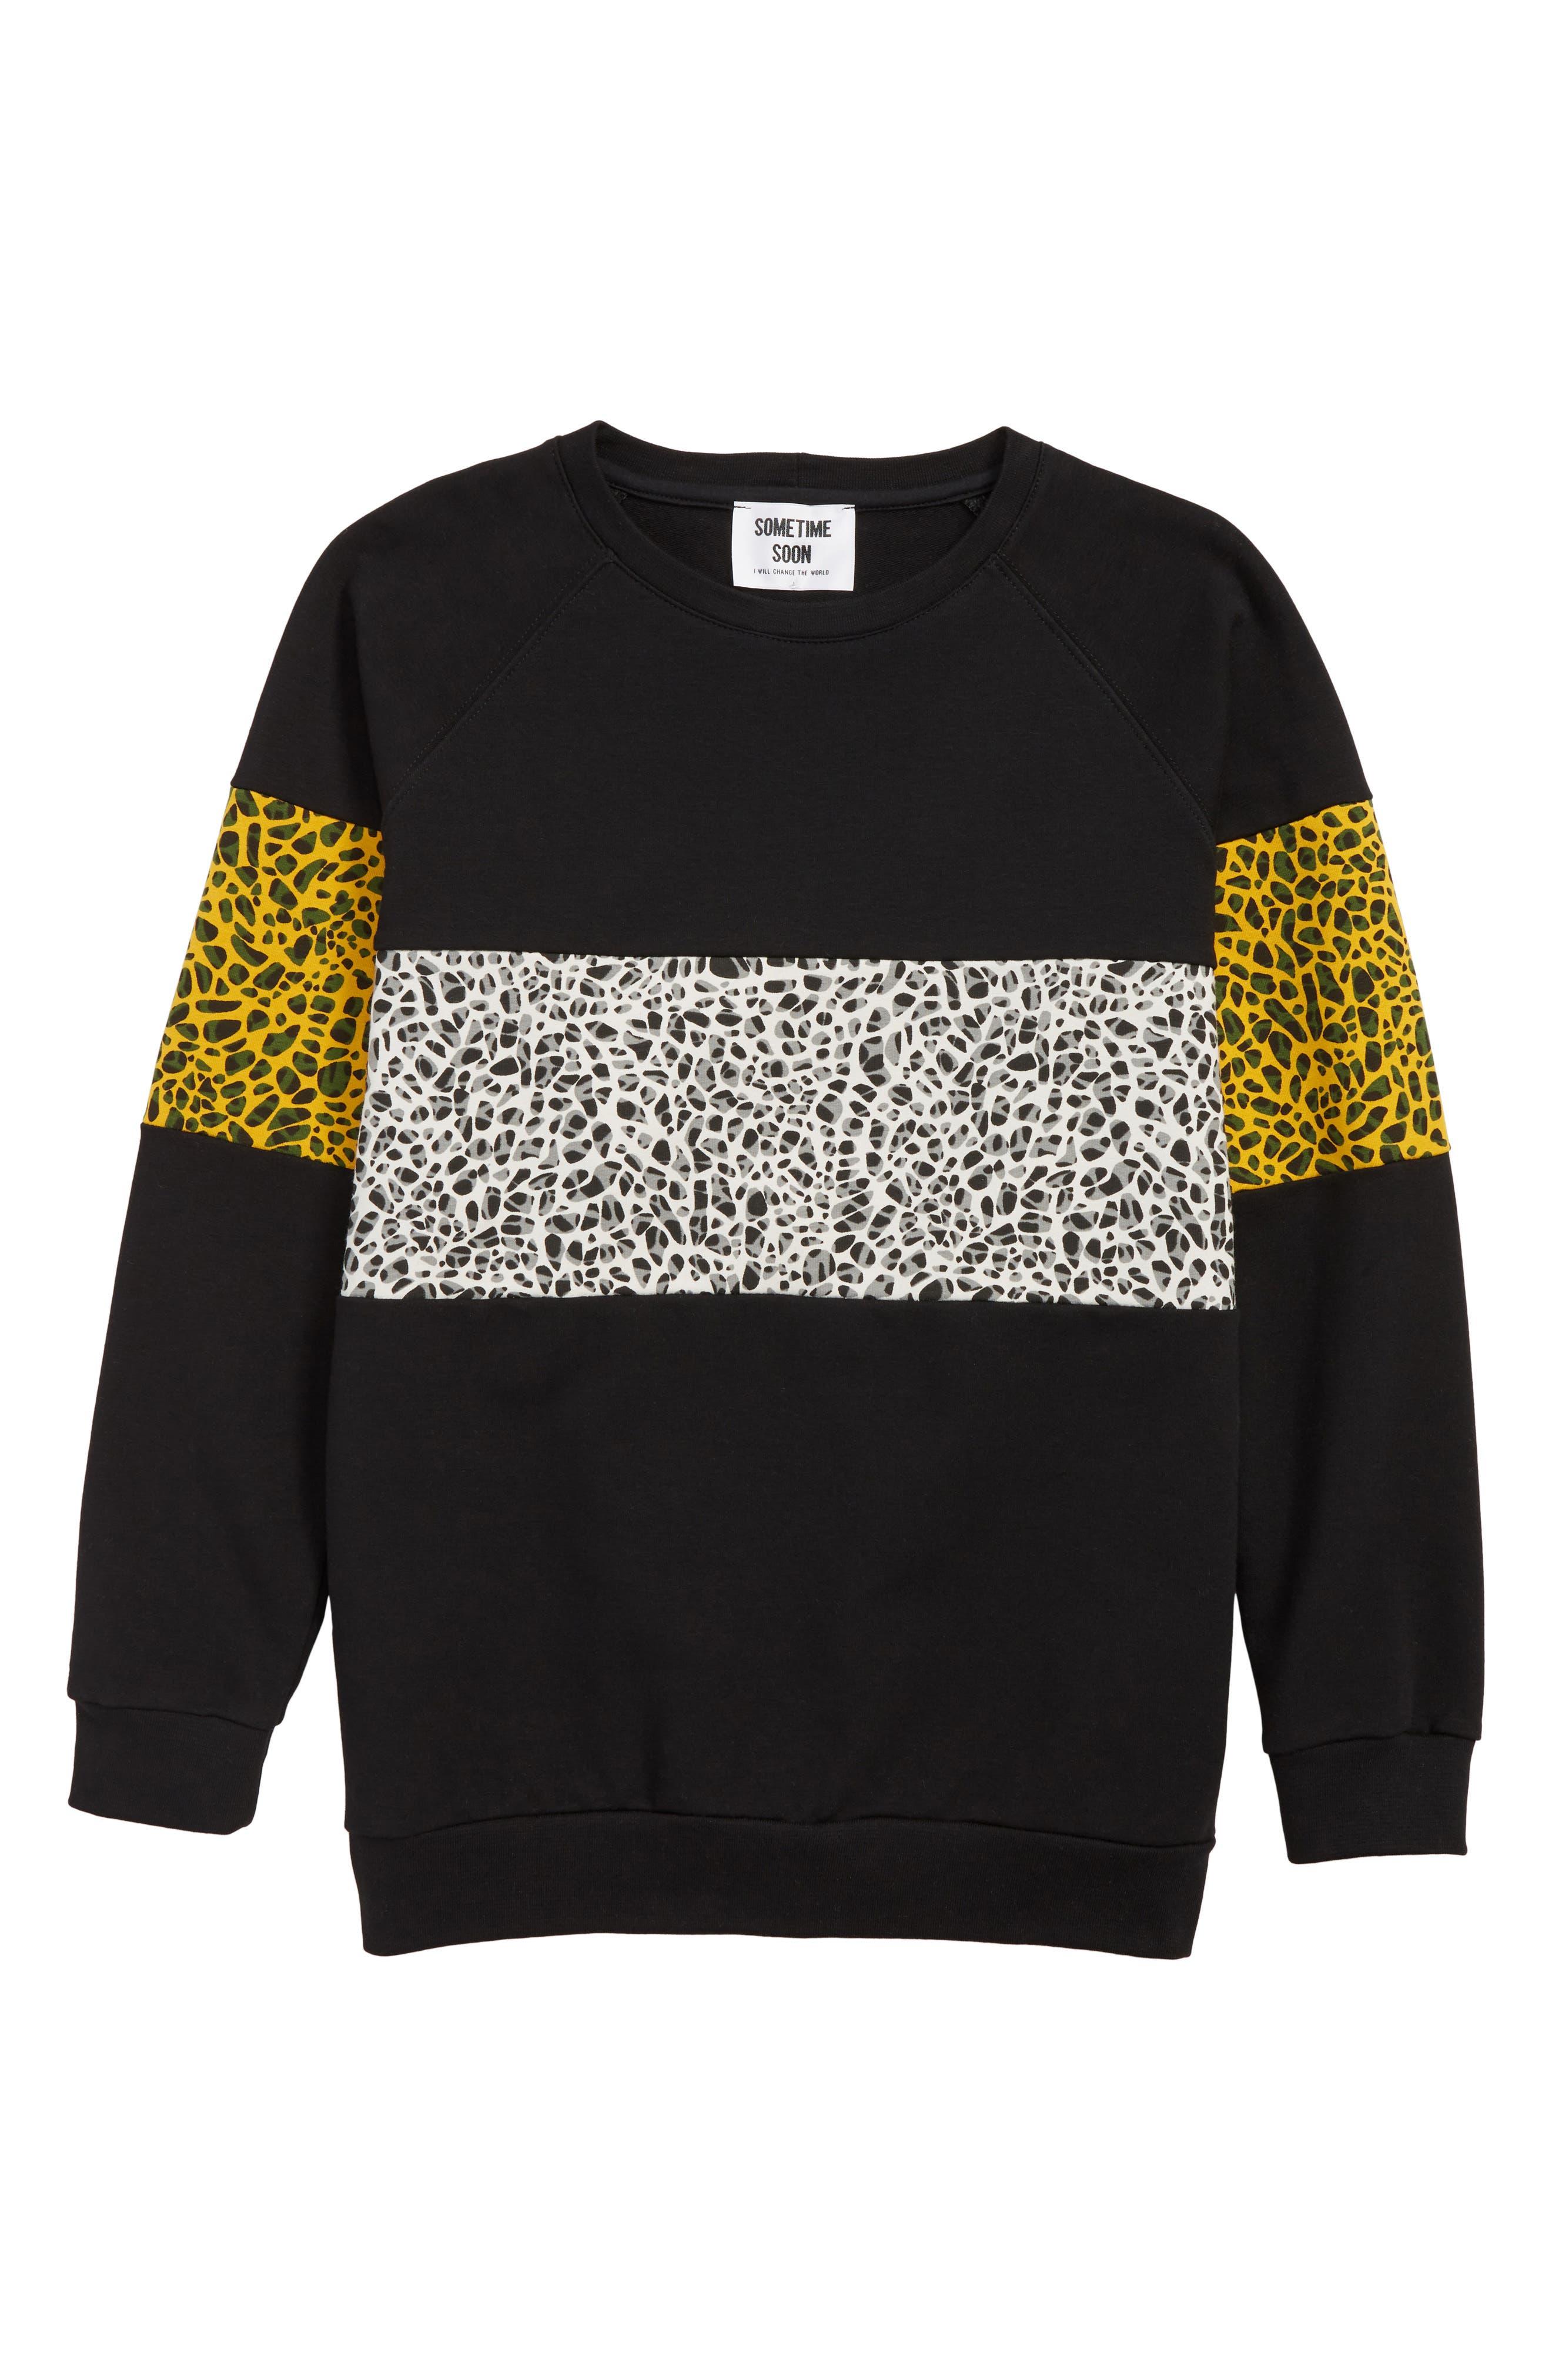 SOMETIME SOON, Delano Organic Cotton Sweatshirt, Main thumbnail 1, color, BLACK